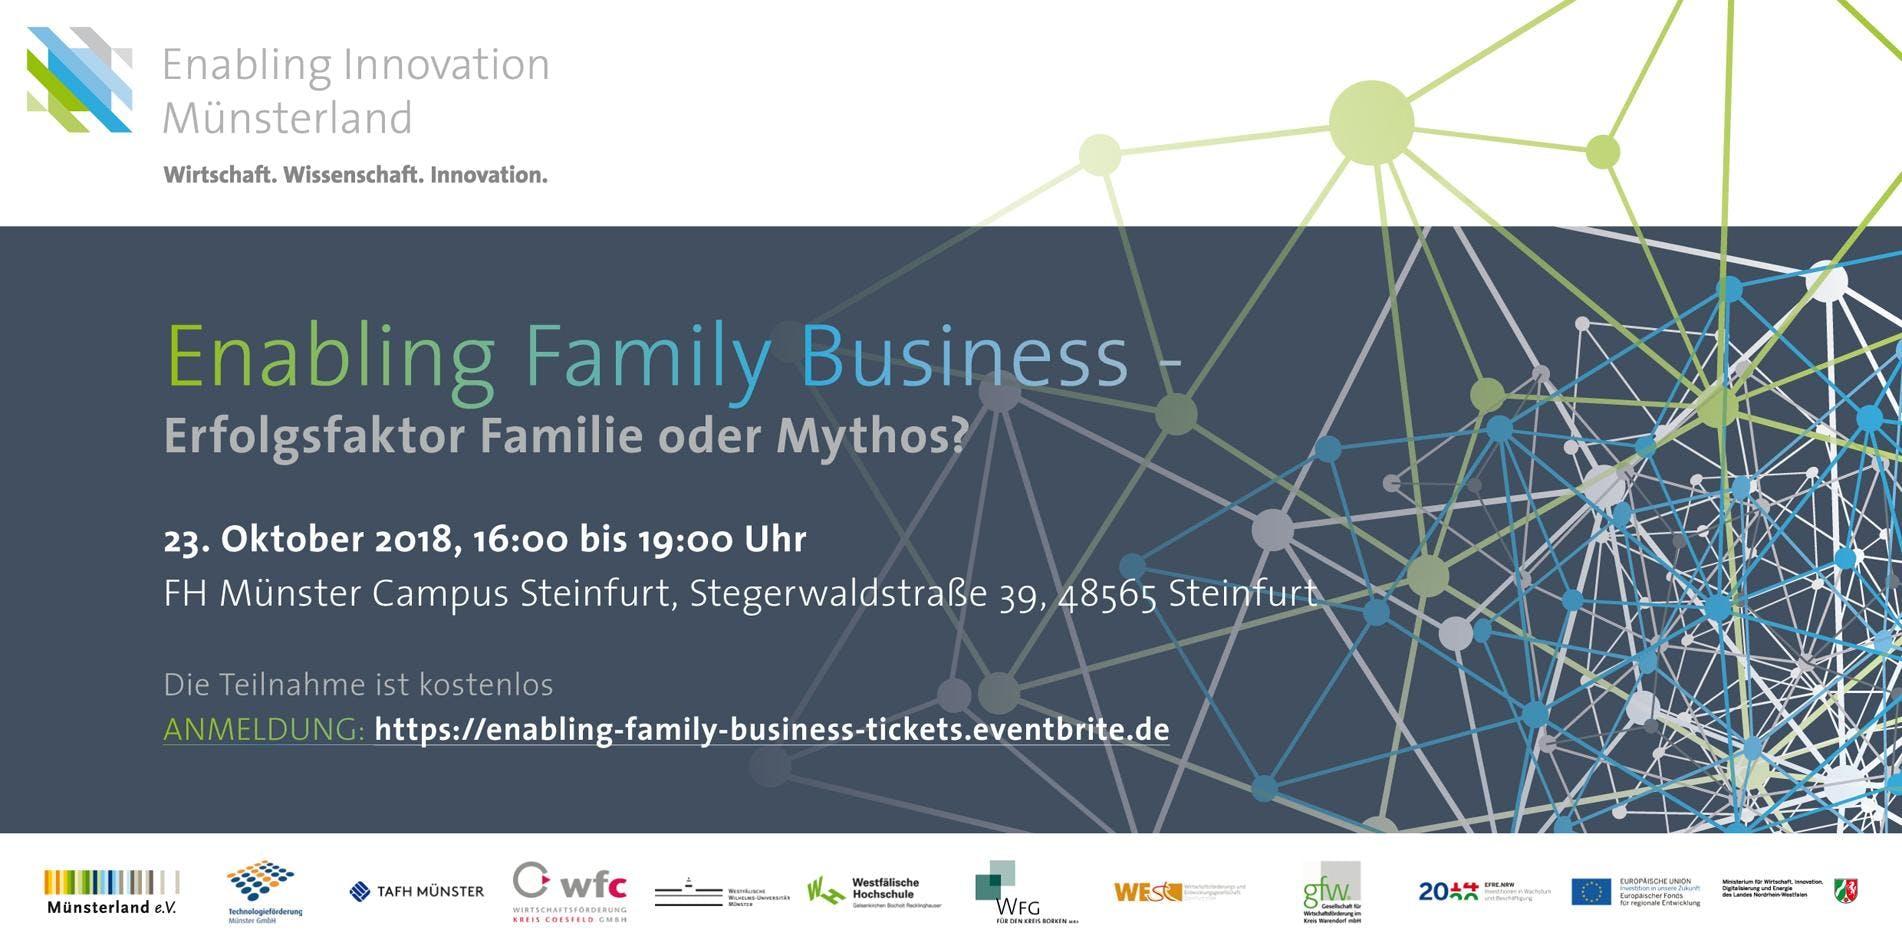 Enabling Family Business